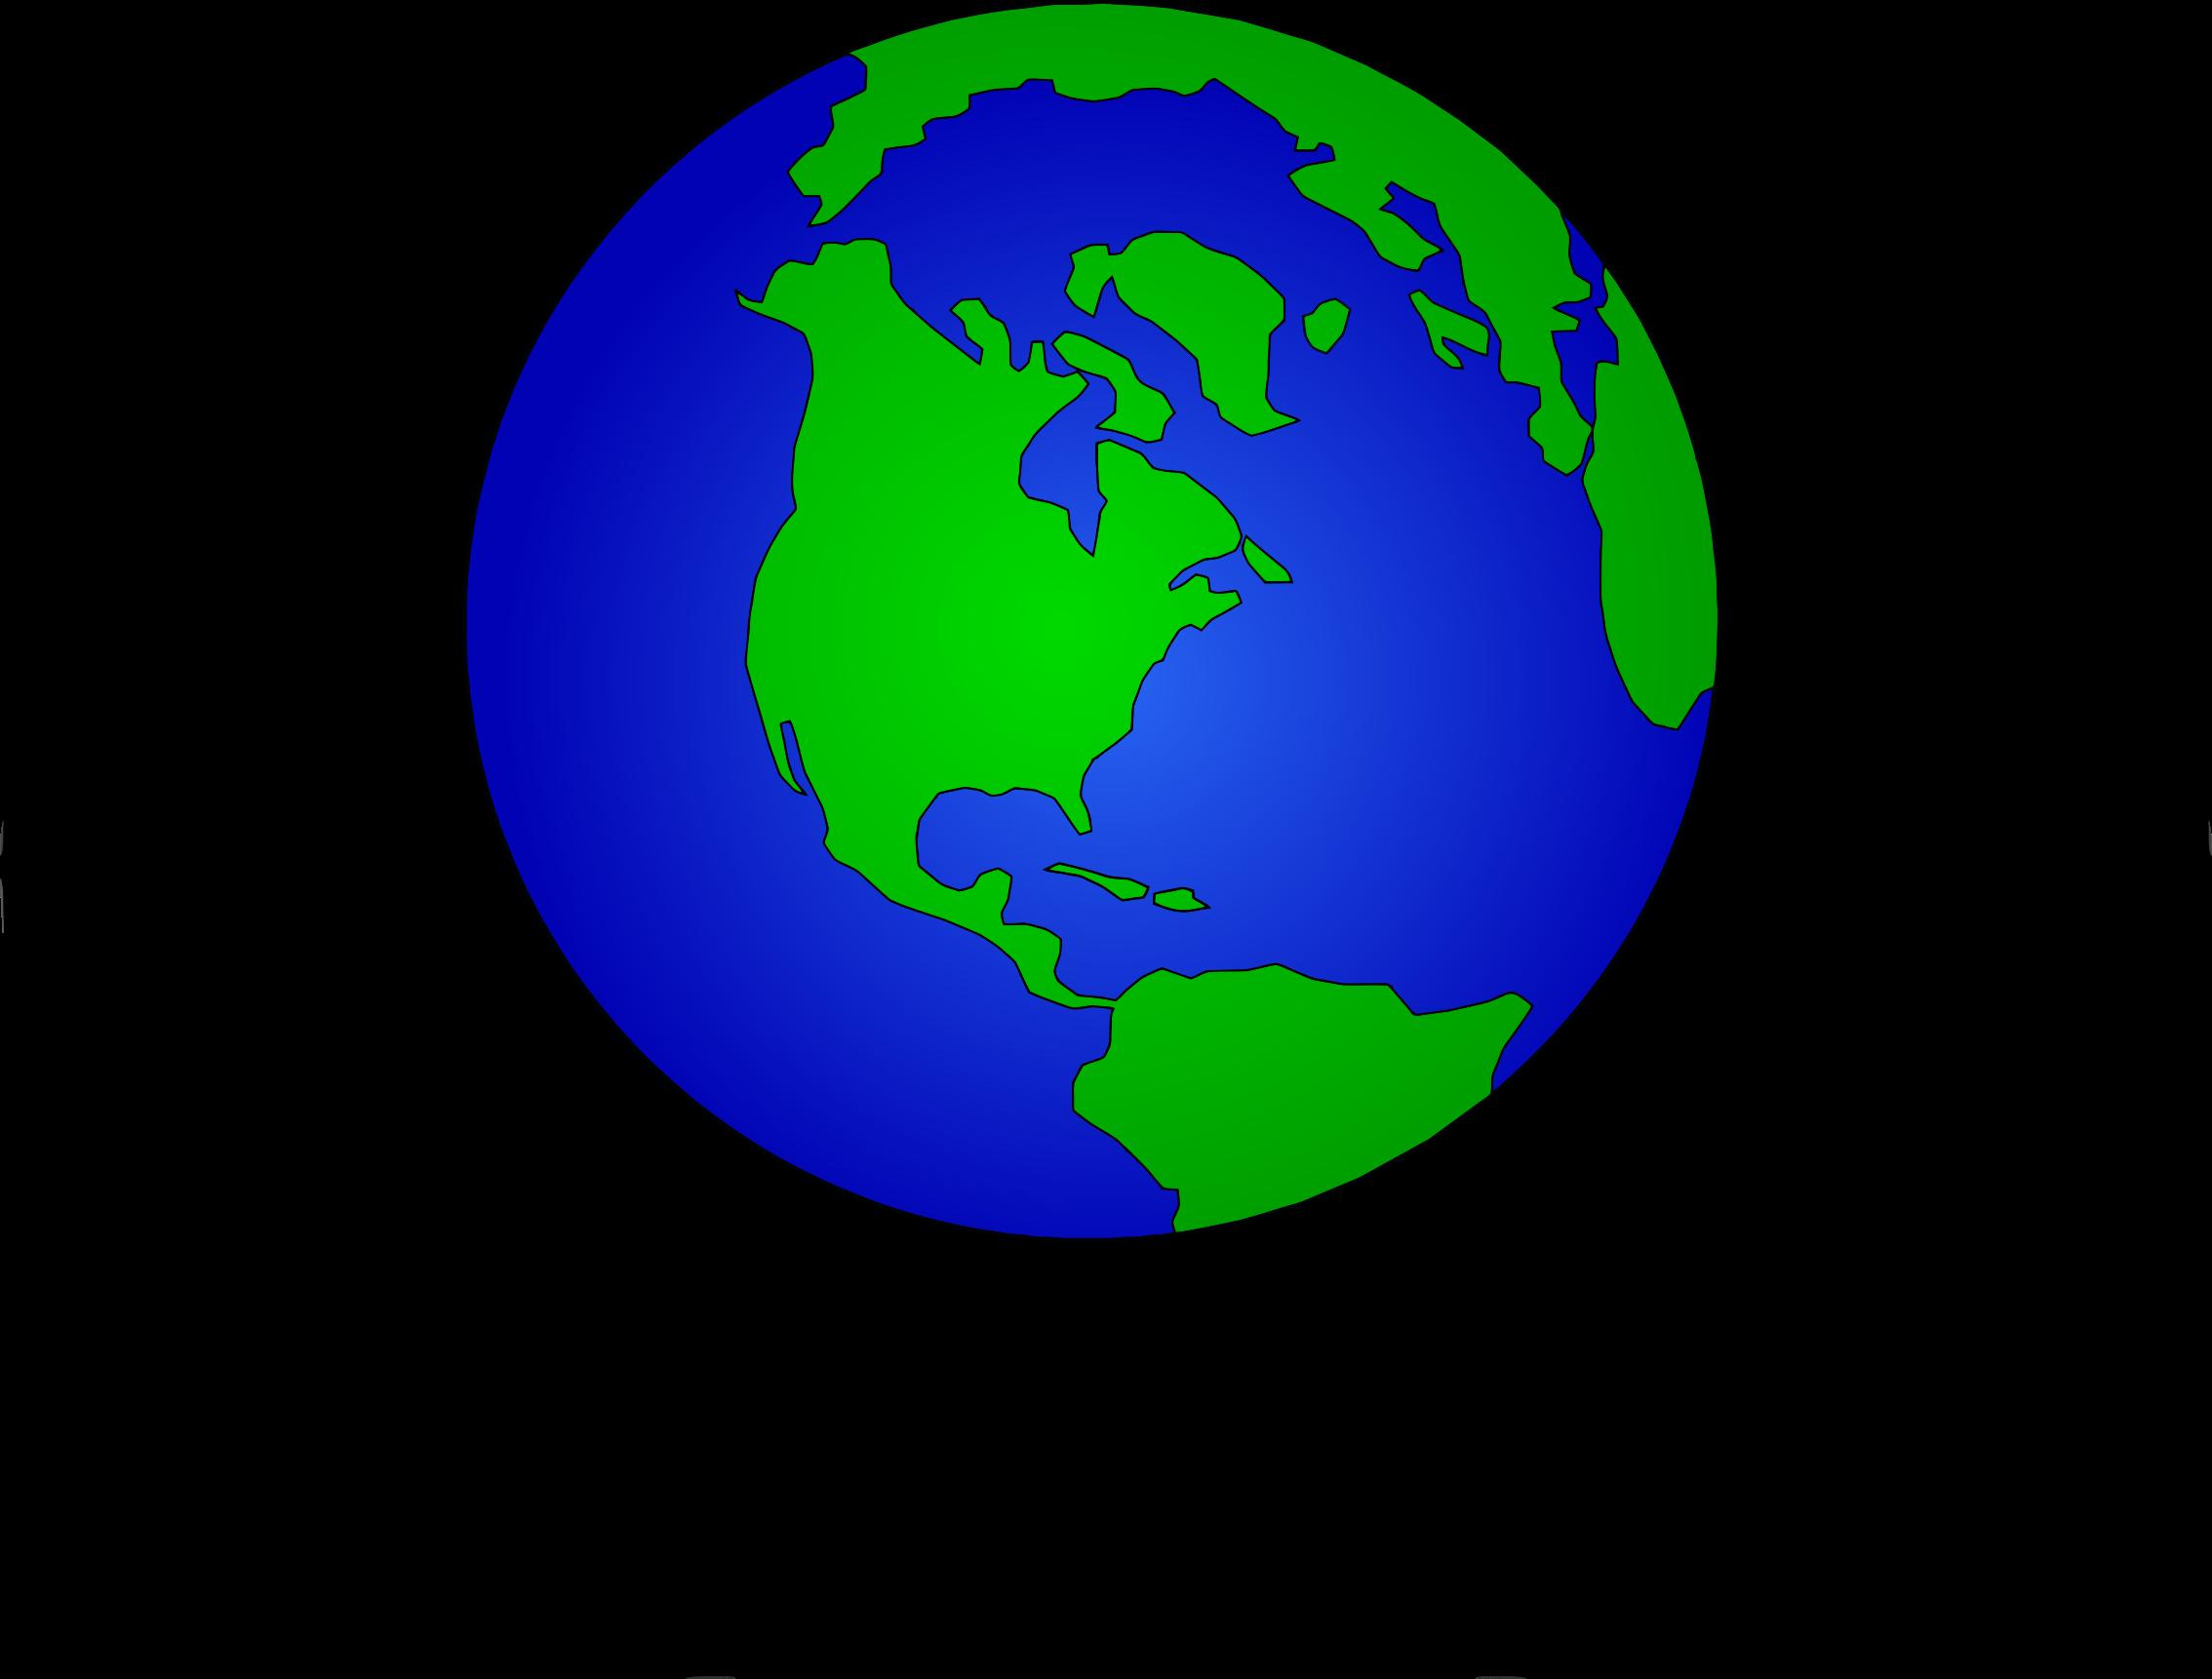 world top globe clip art free clipart image [ 2268 x 1722 Pixel ]